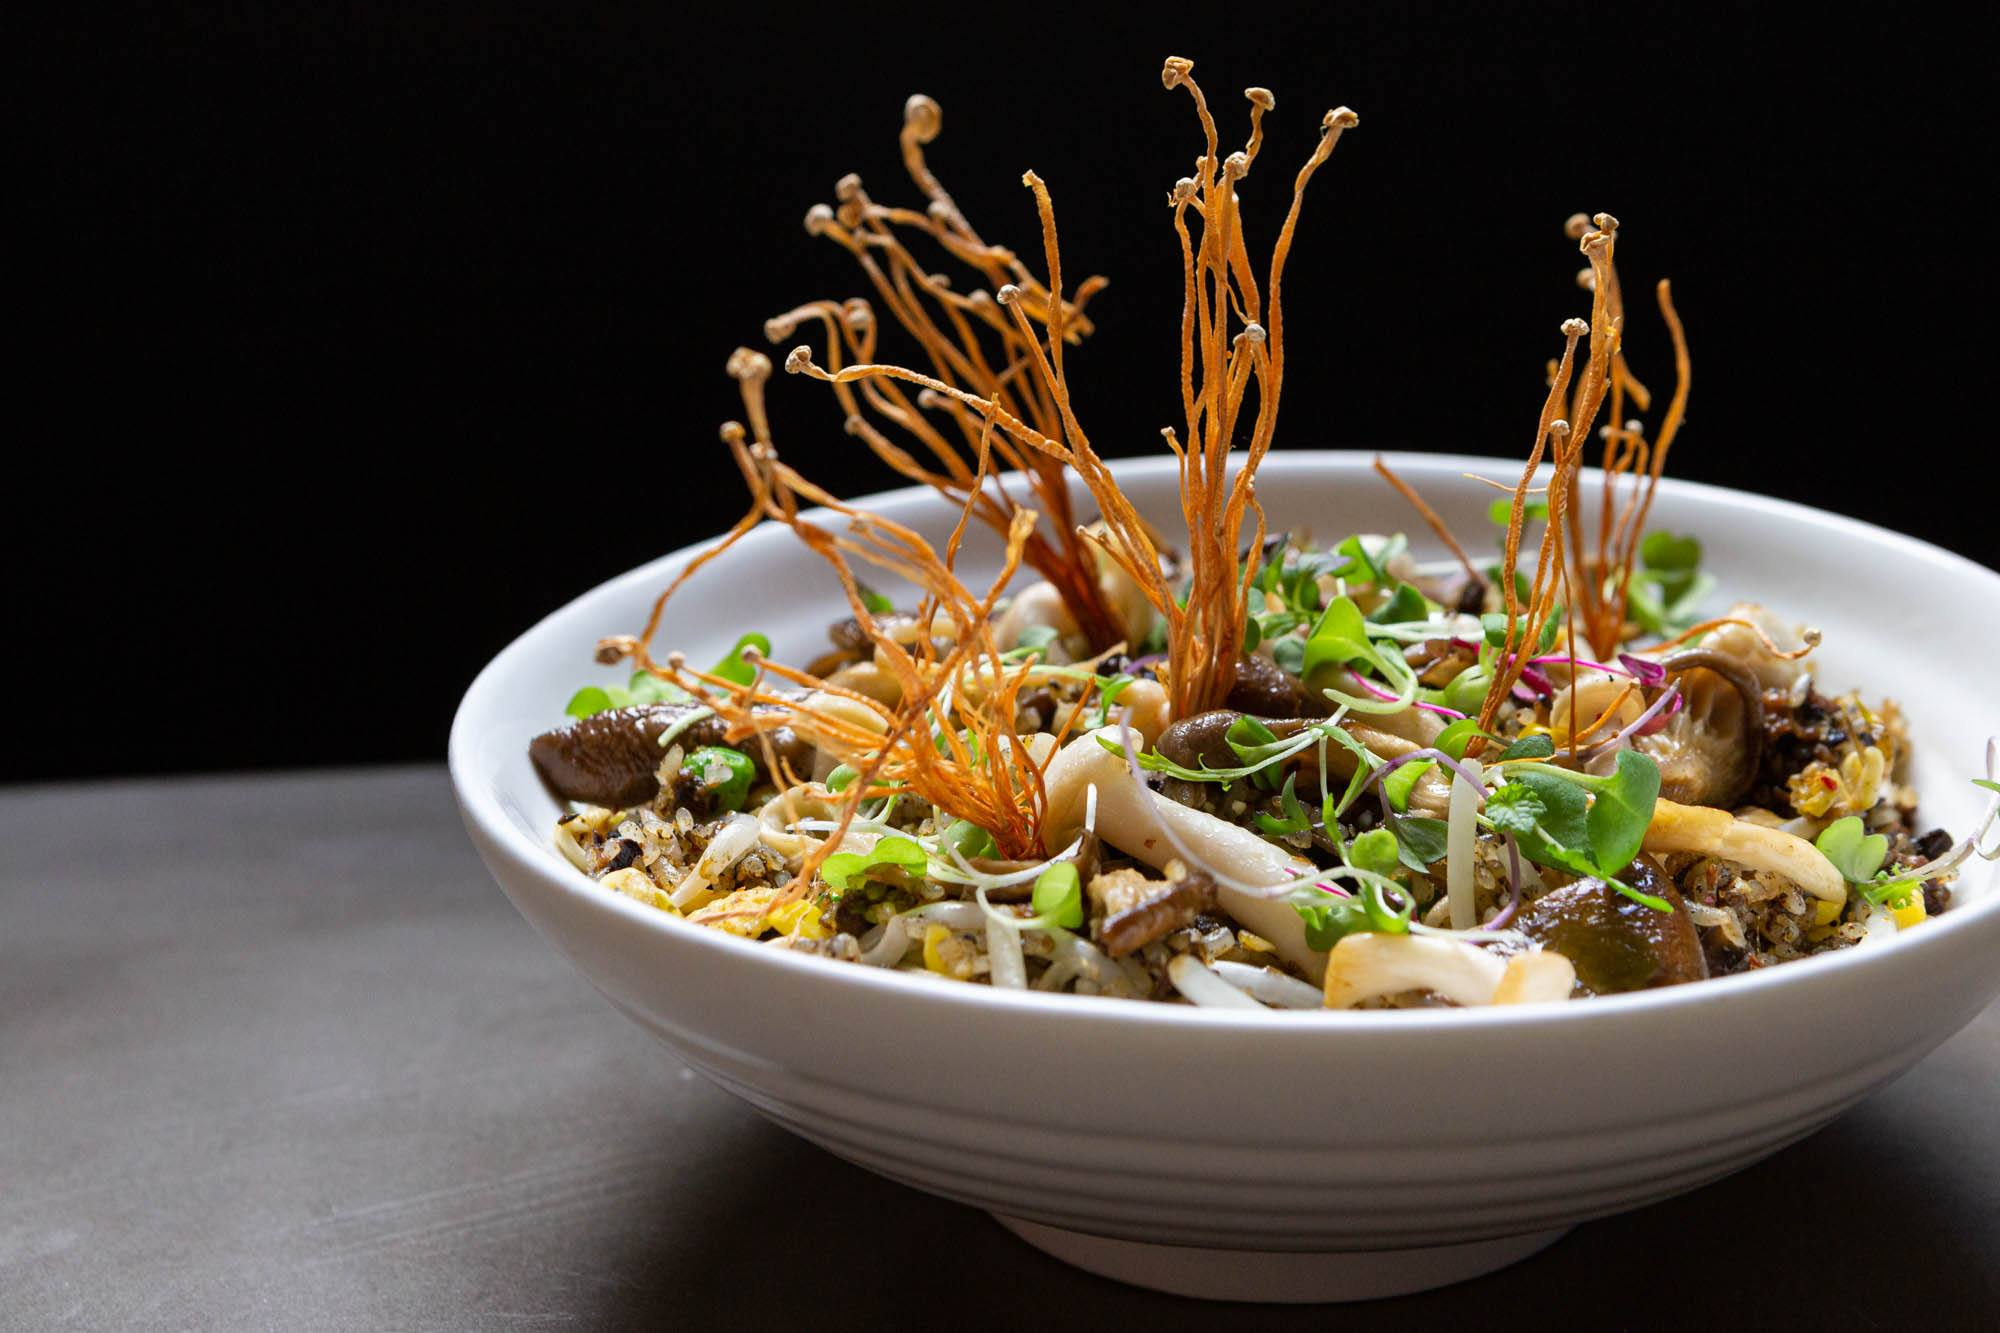 R&D Fried Rice, smoked portobello, XO duxelles, chinese olive leaf, egg, peas, corn